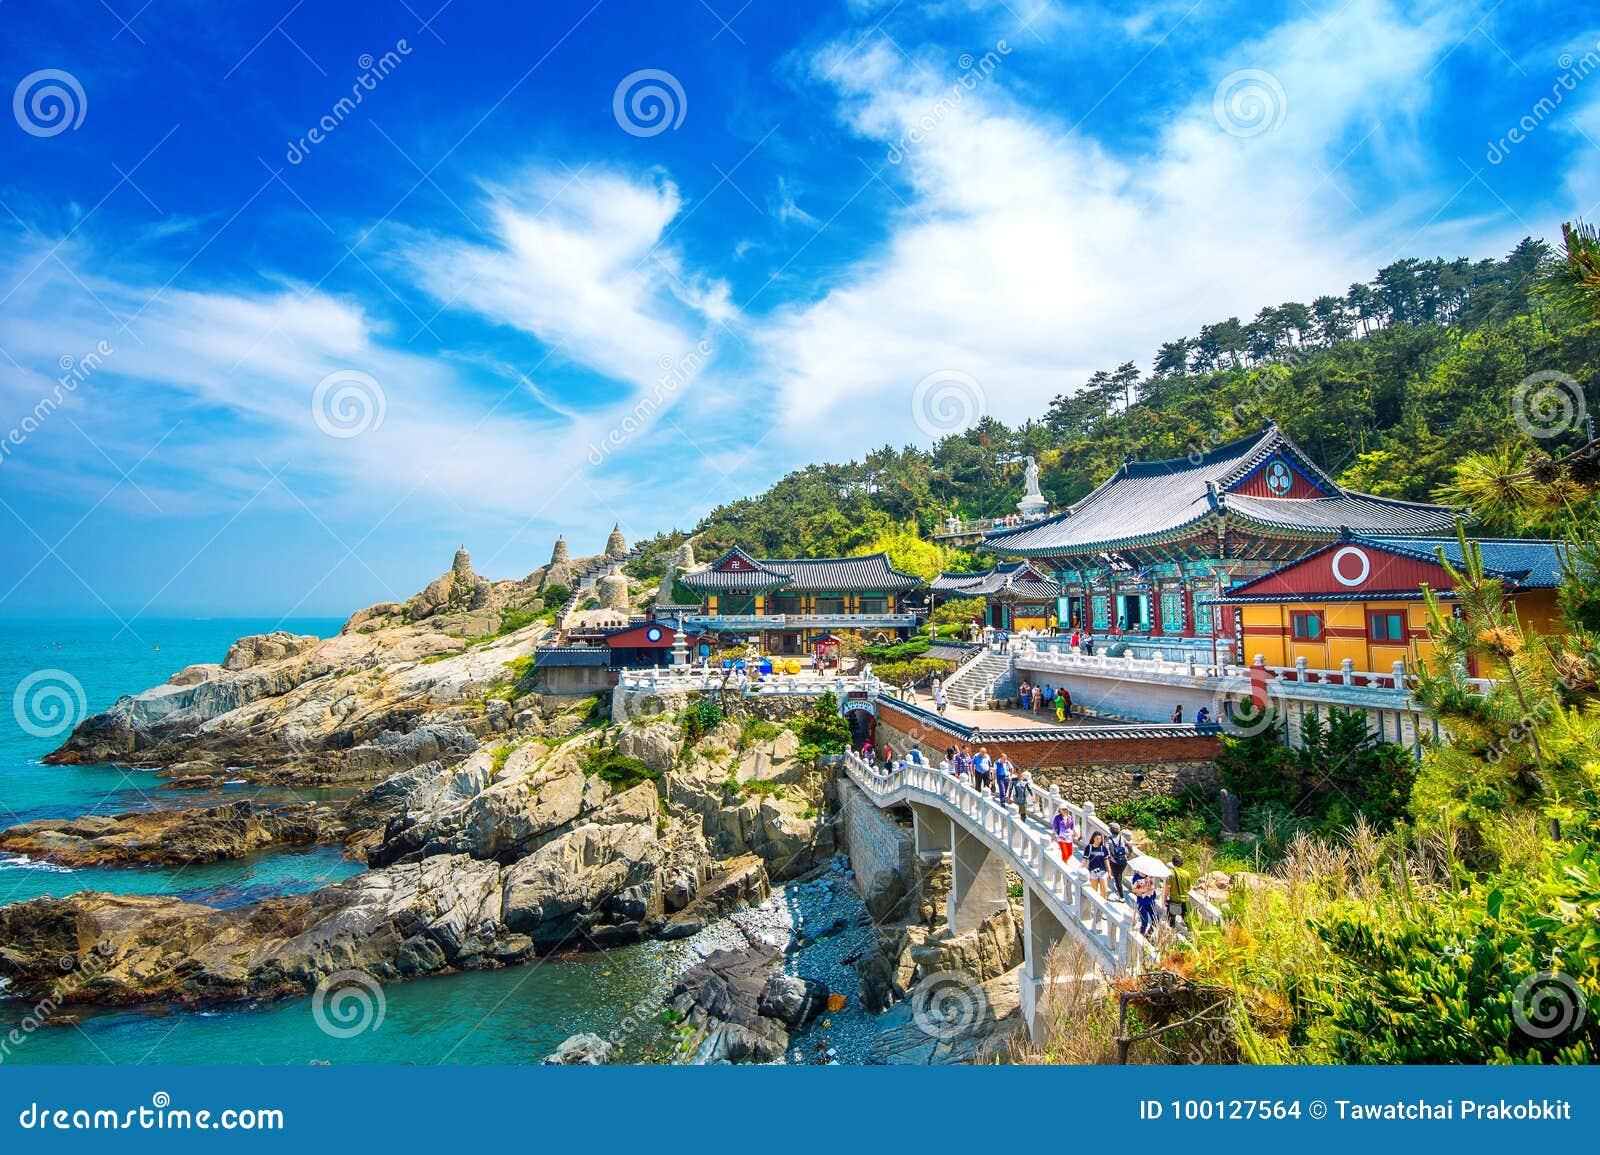 Haedong Yonggungsa Temple and Haeundae Sea in Busan, Buddhist temple in Busan, South Korea